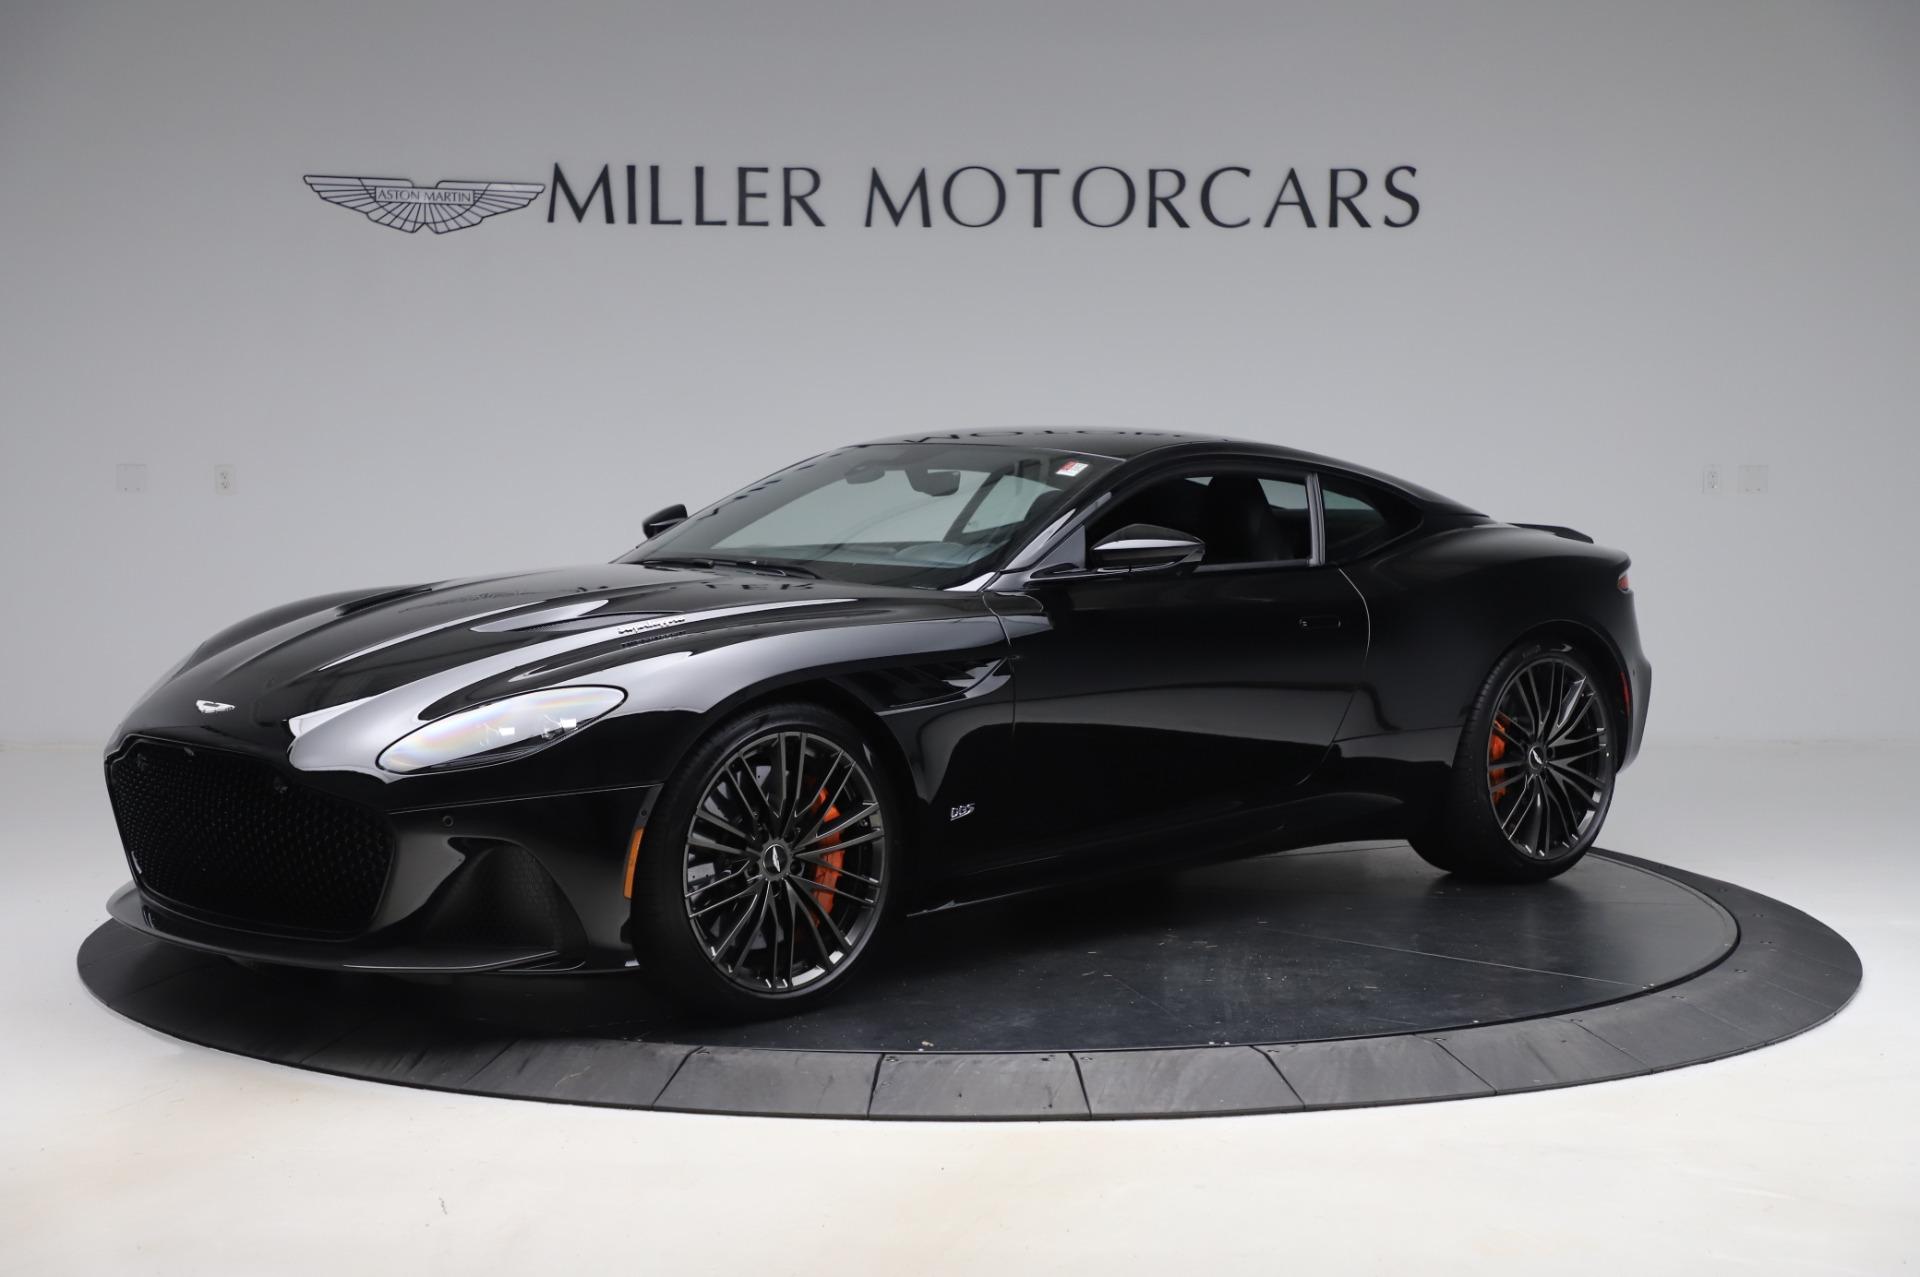 New 2020 Aston Martin Dbs Superleggera For Sale 328 786 Miller Motorcars Stock A1502